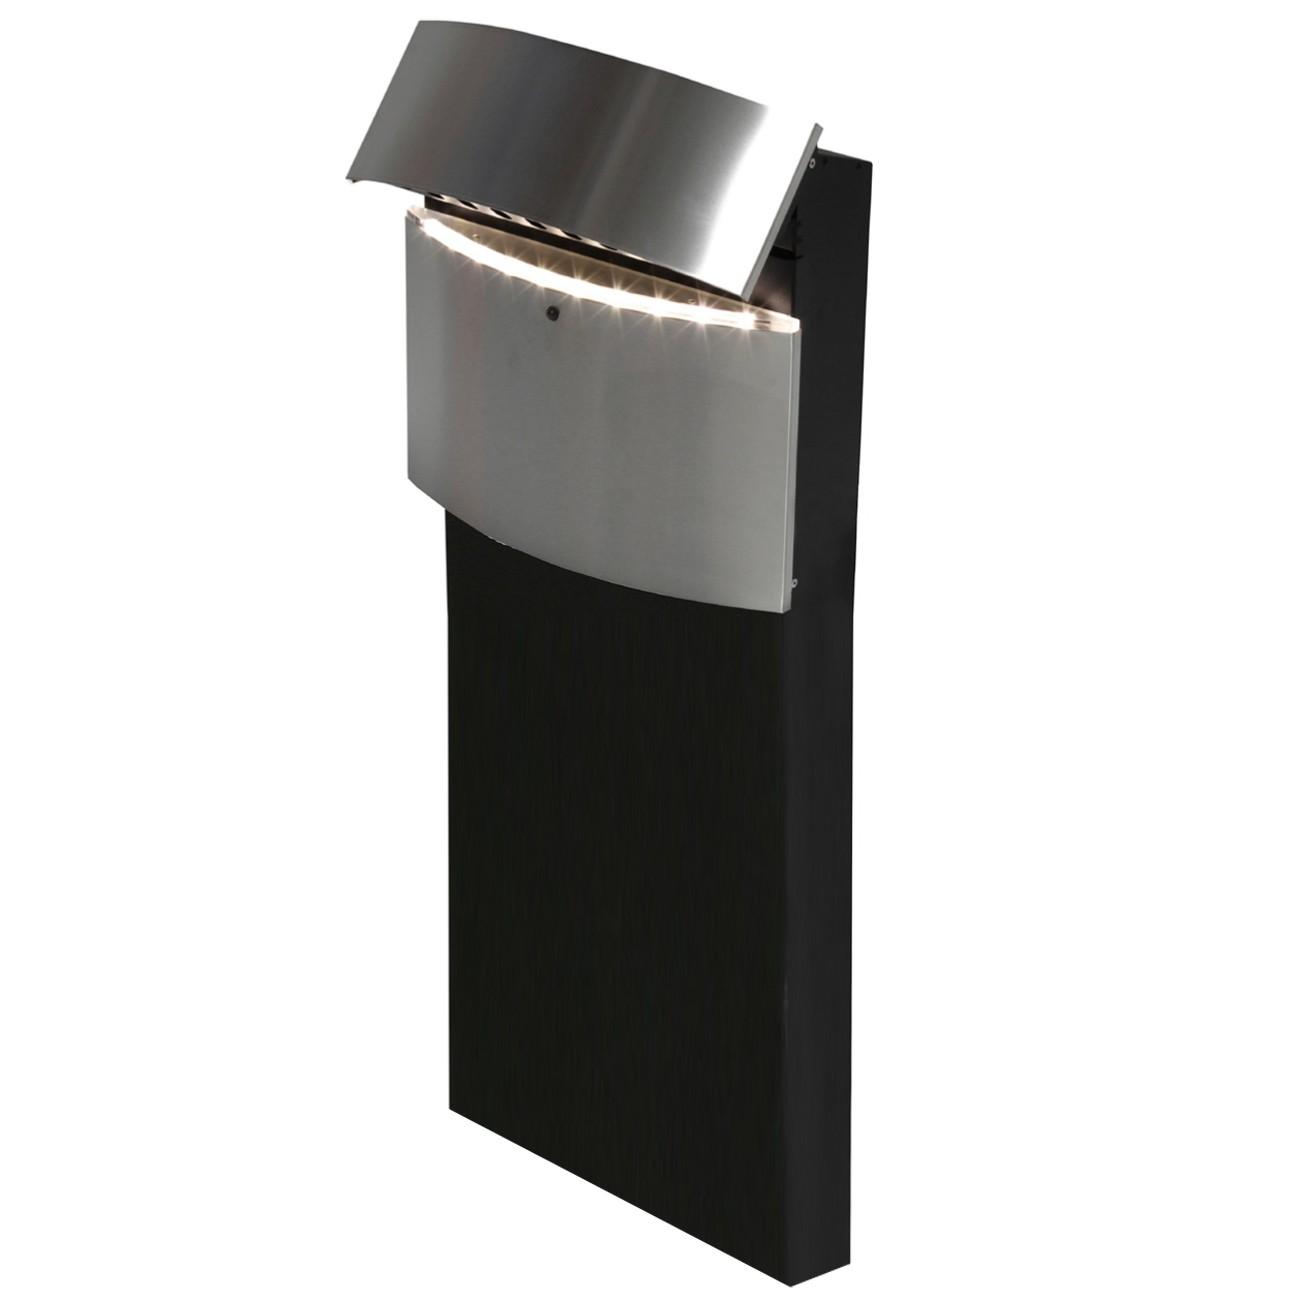 safepost 128 led standbriefkasten schwarz mit edelstahlfront 100 x 40 cm eingang garten. Black Bedroom Furniture Sets. Home Design Ideas